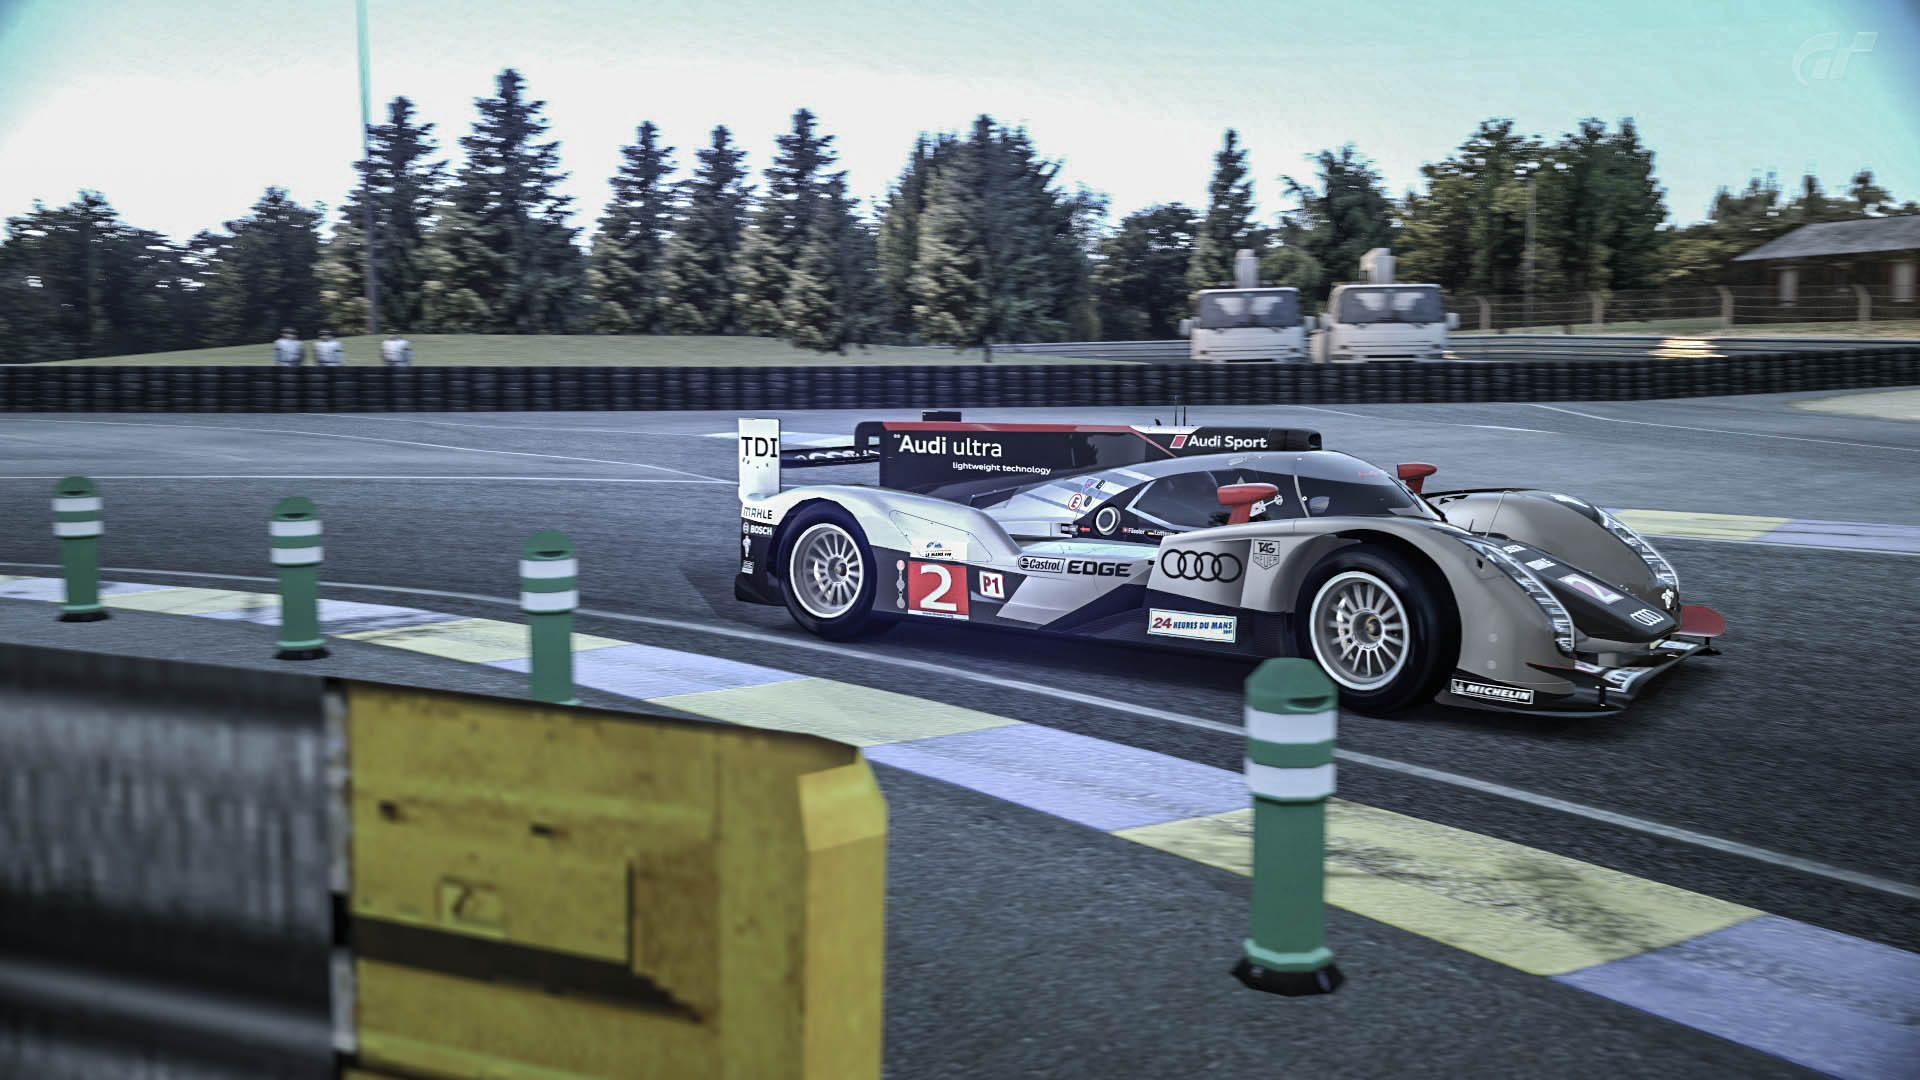 Circuit de la Sarthe 2013_23.jpg